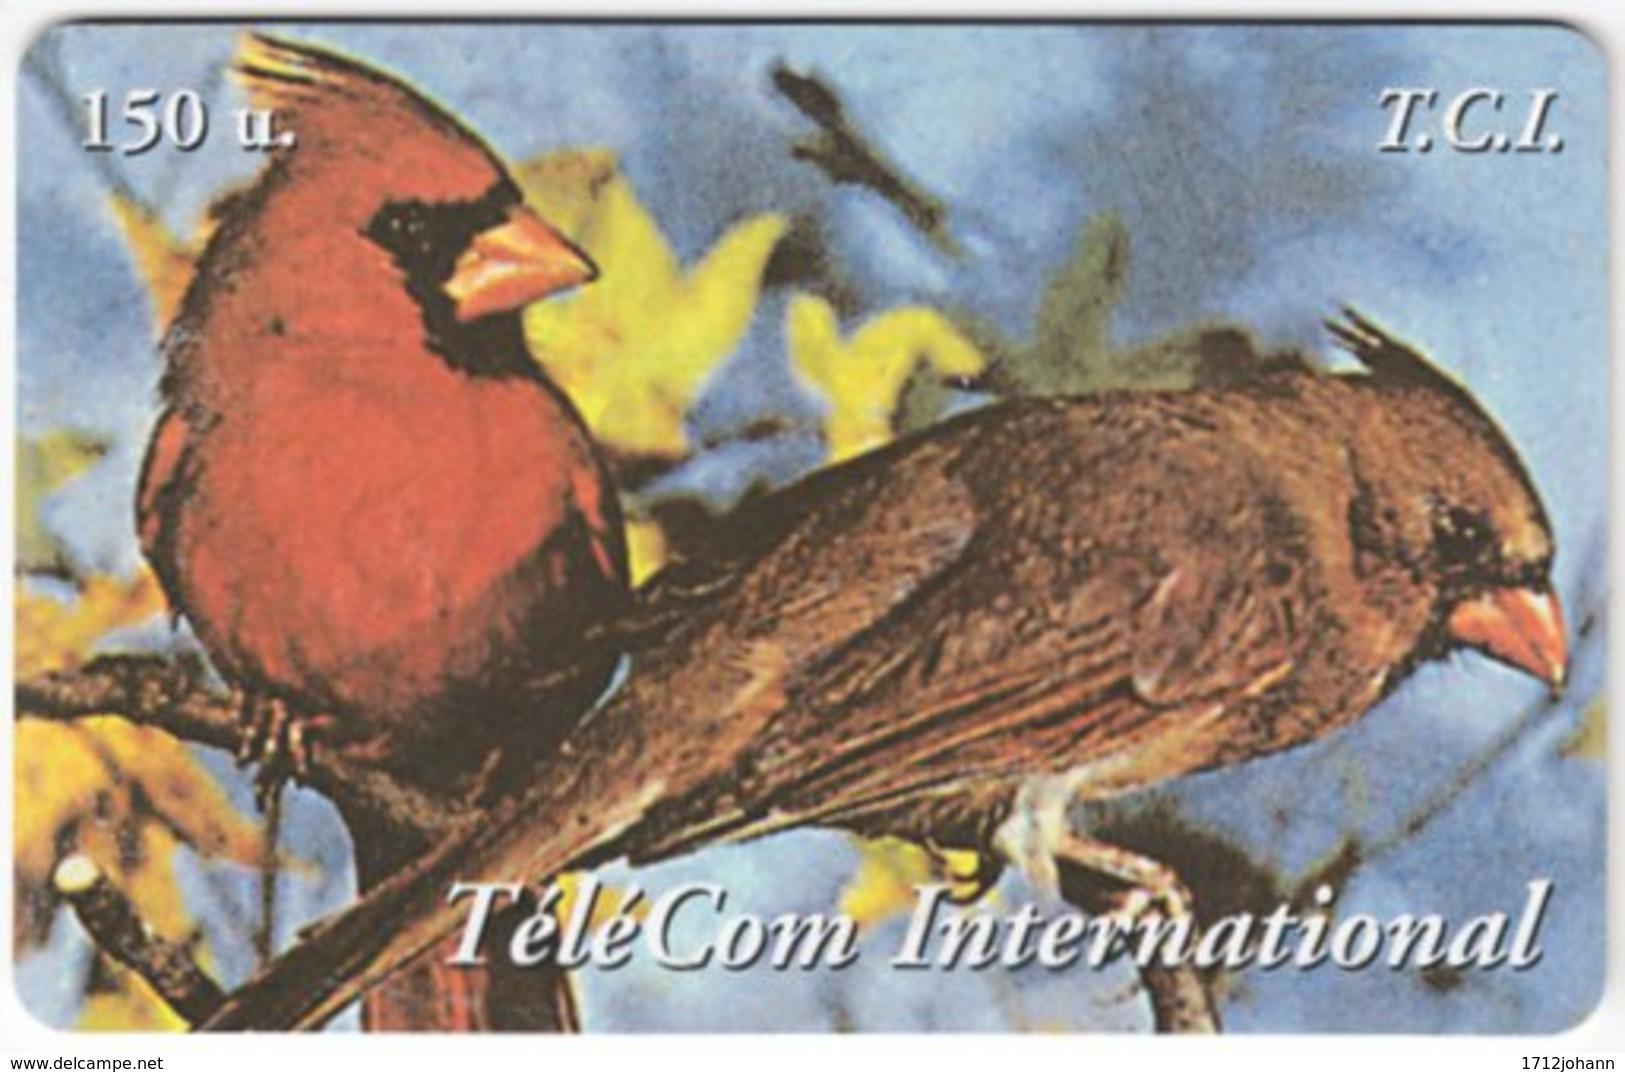 FRANCE C-521 Prepaid TCI - Animal, Bird - Used - Nachladekarten (Refill)